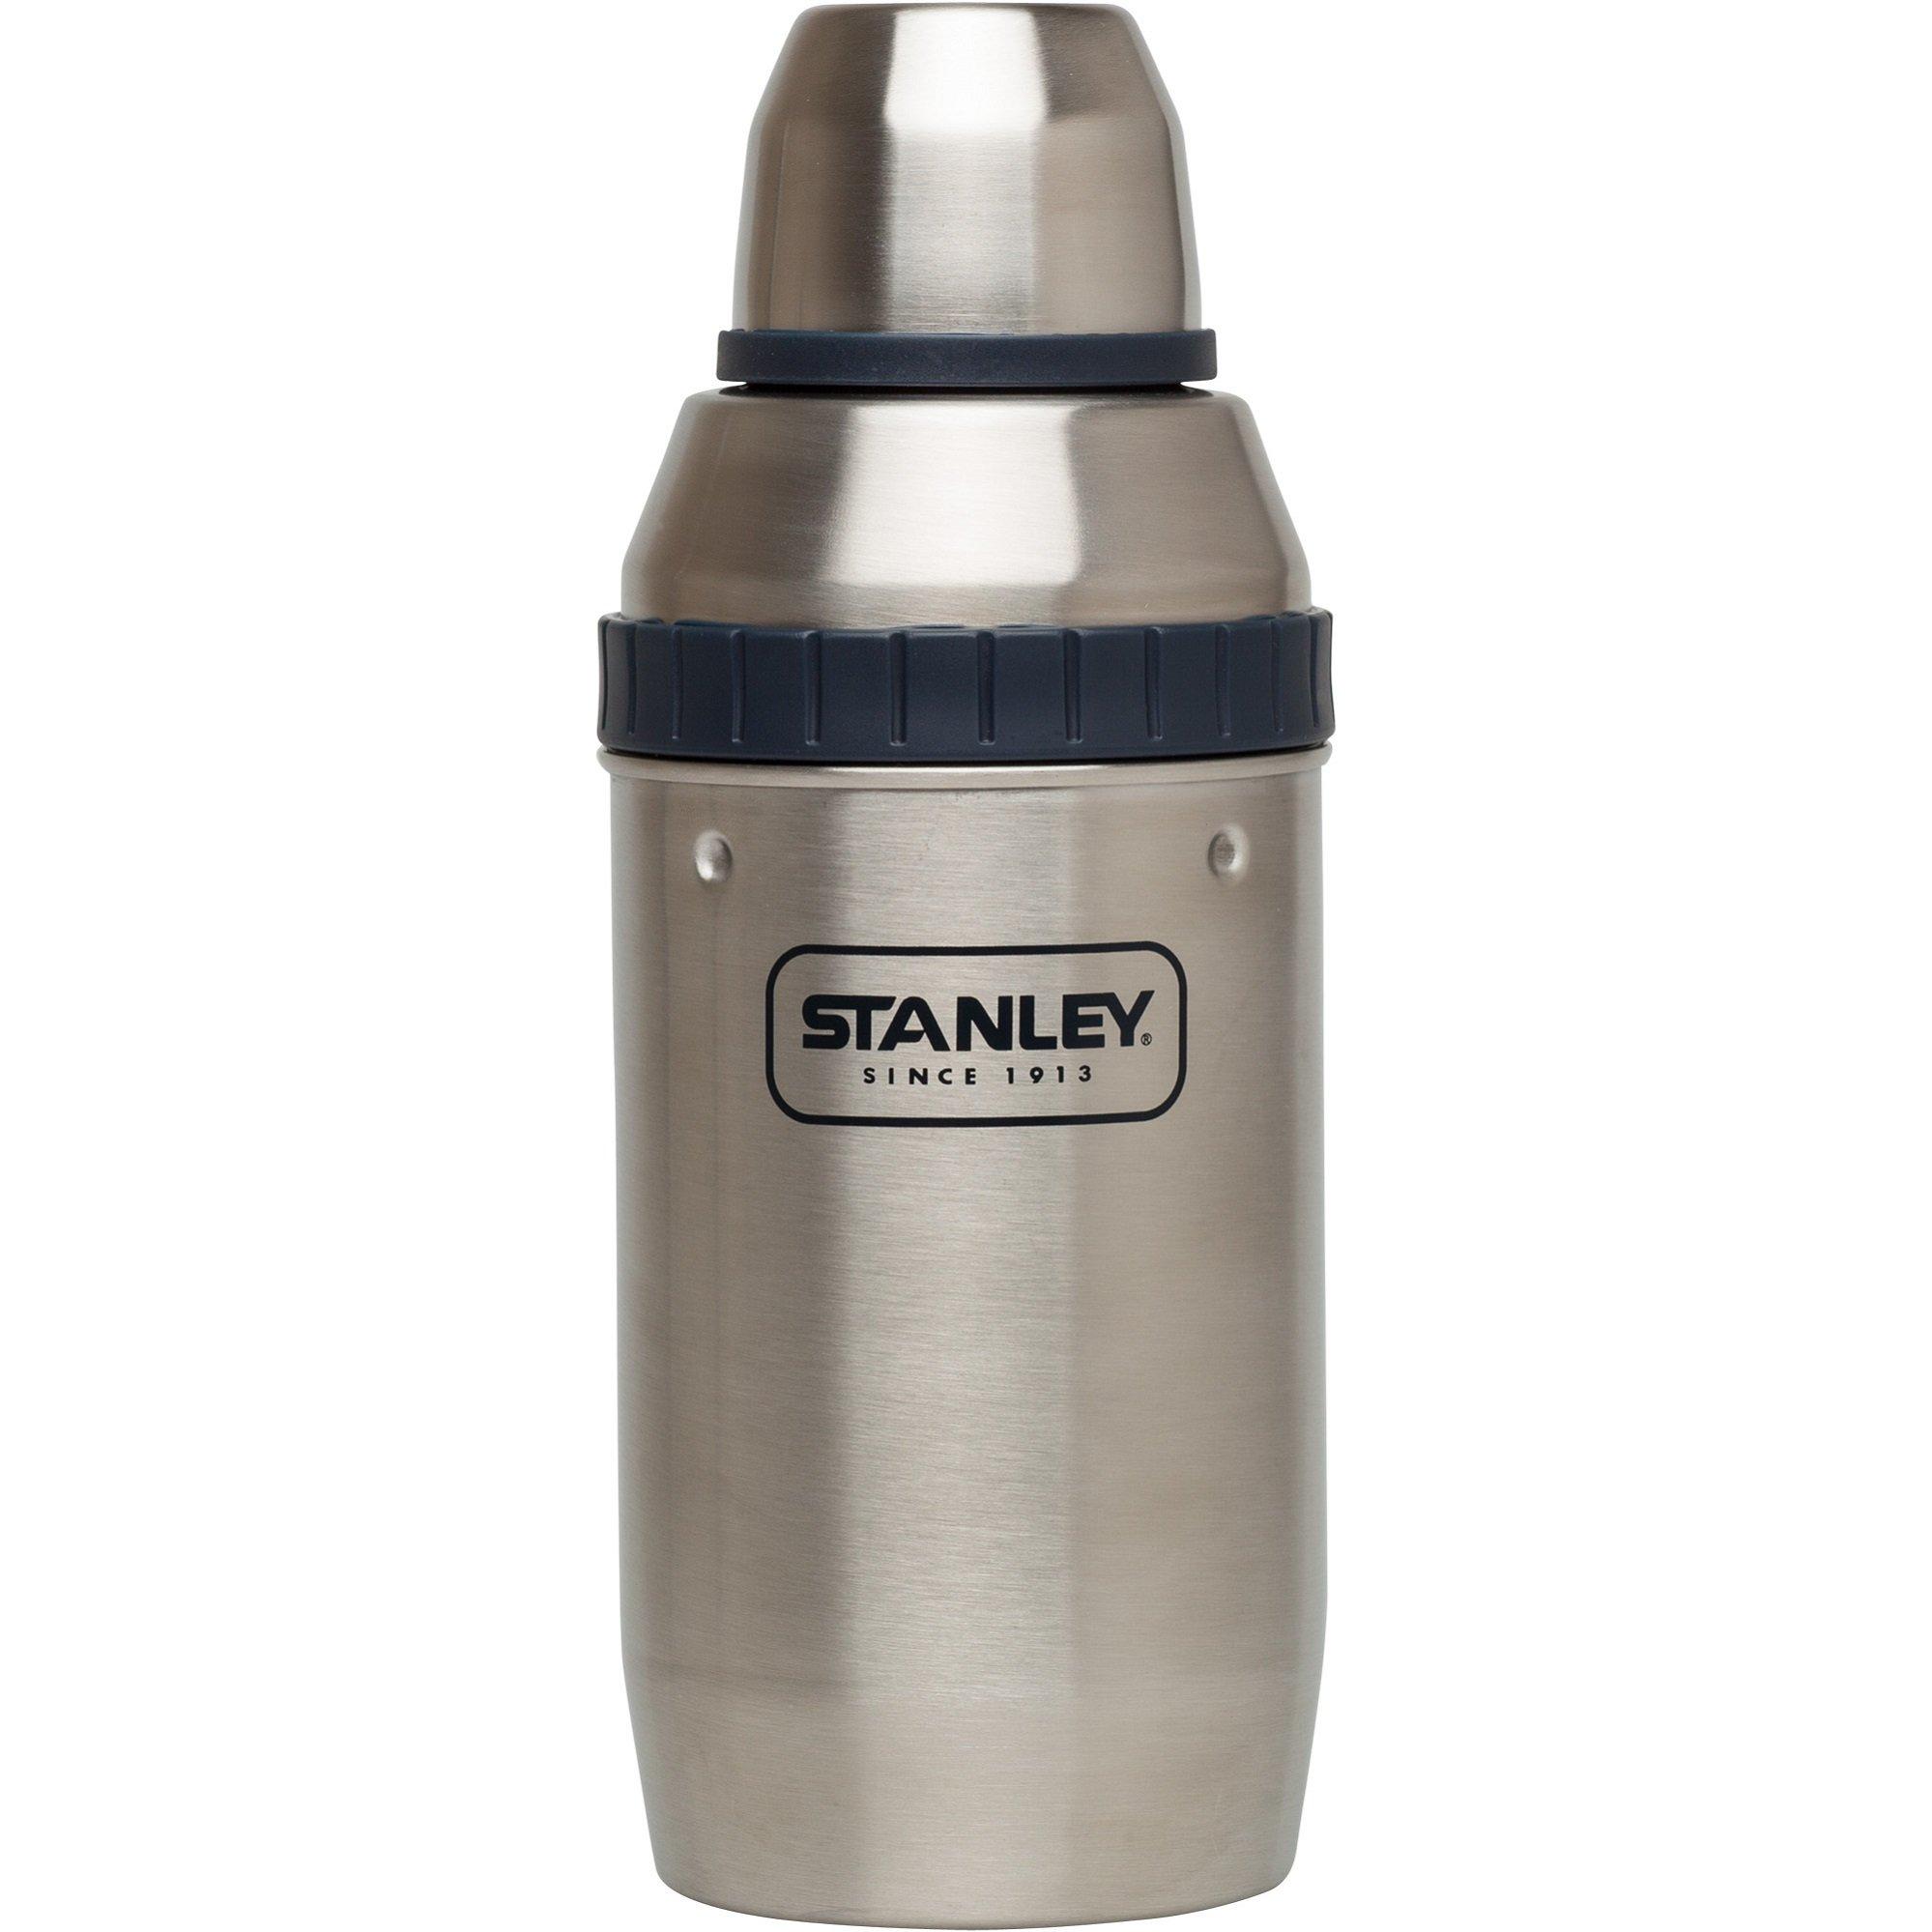 Stanley Adventure Stainless Steel Happy Hour Shaker